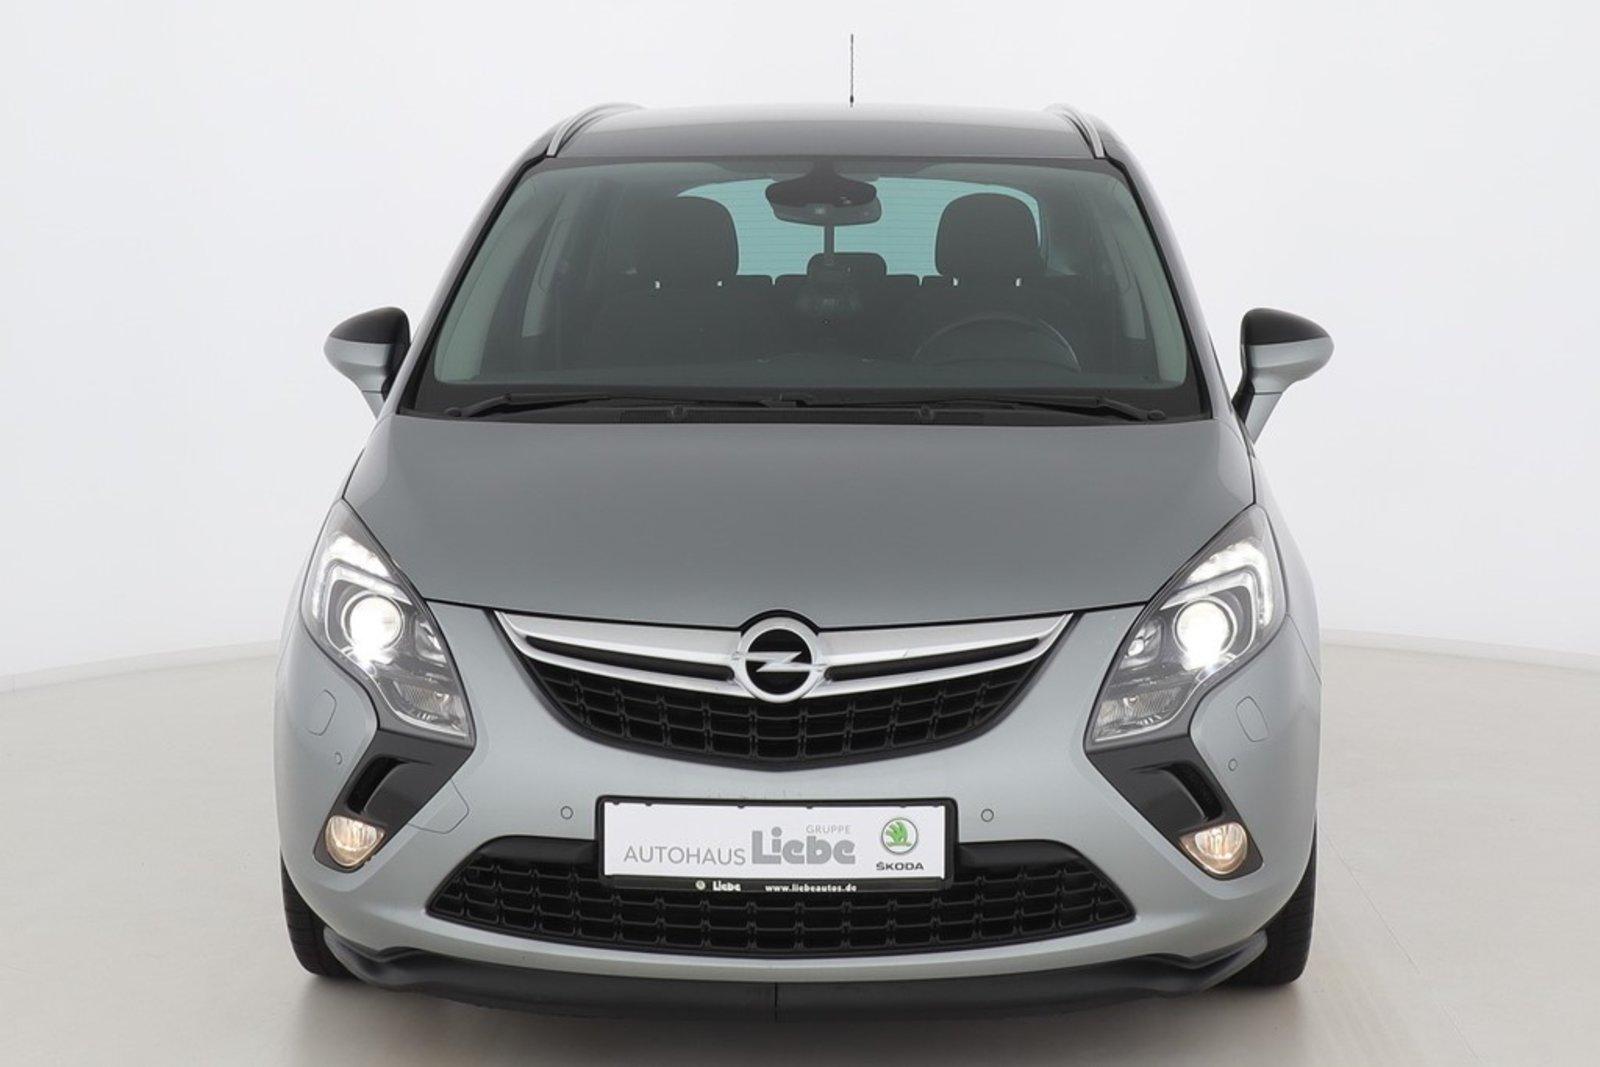 Opel ZAFIRA TOURER C STYLE BI-XENON SHZ PDC FLEX-FIX, Jahr 2015, Diesel